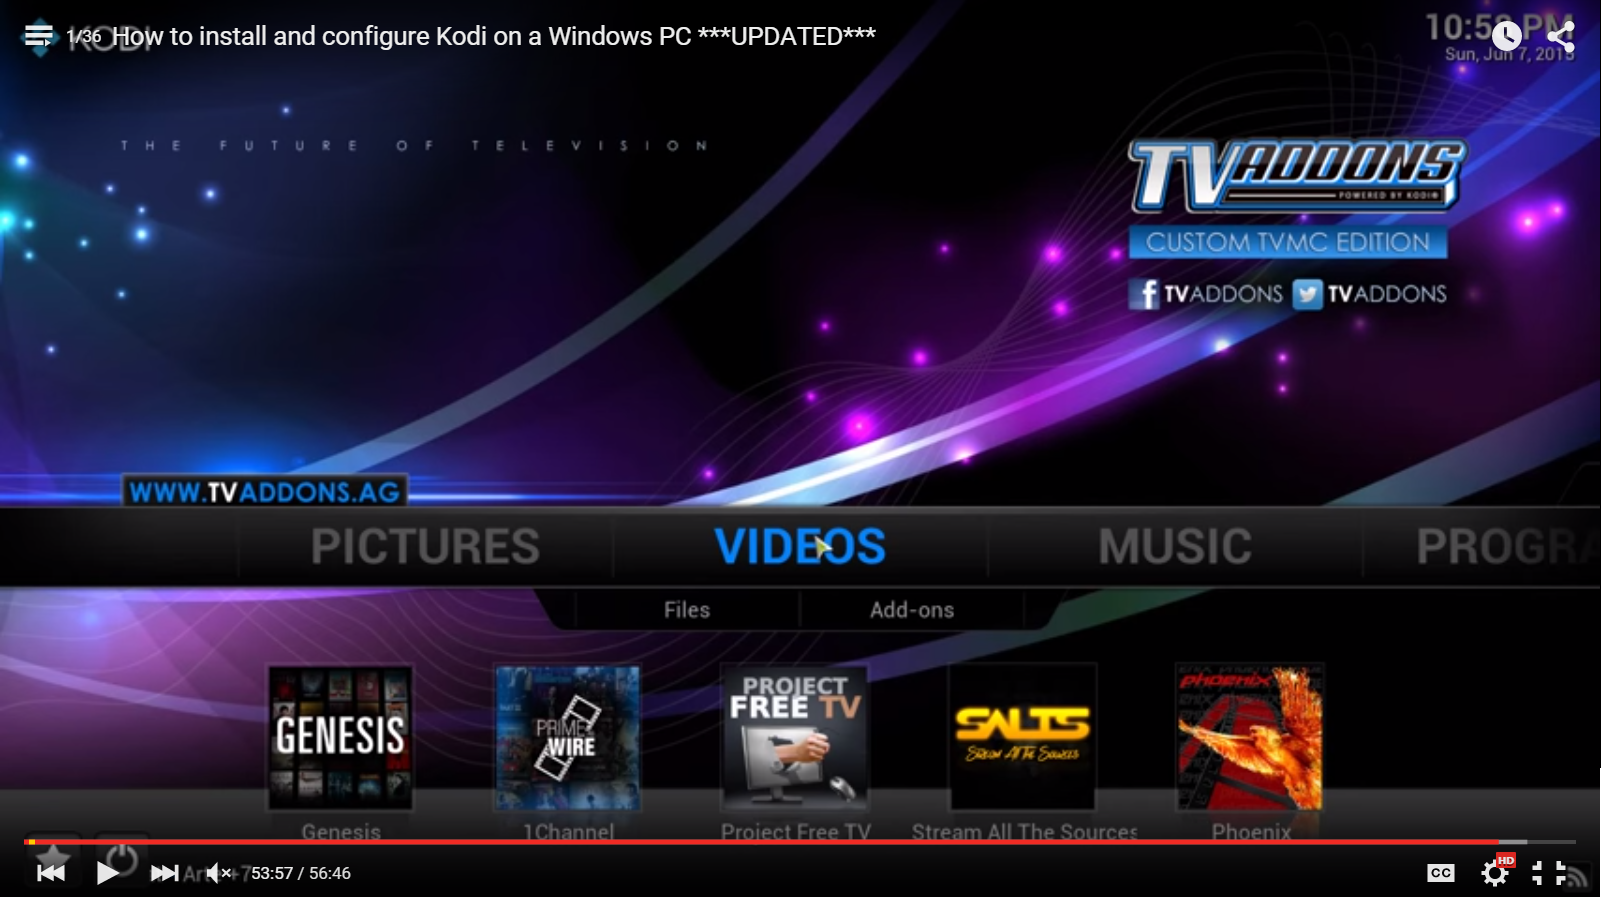 How To Install Kodi Tv Addons On A Windows Pc Kodi Pinterest Tvs How To  Install